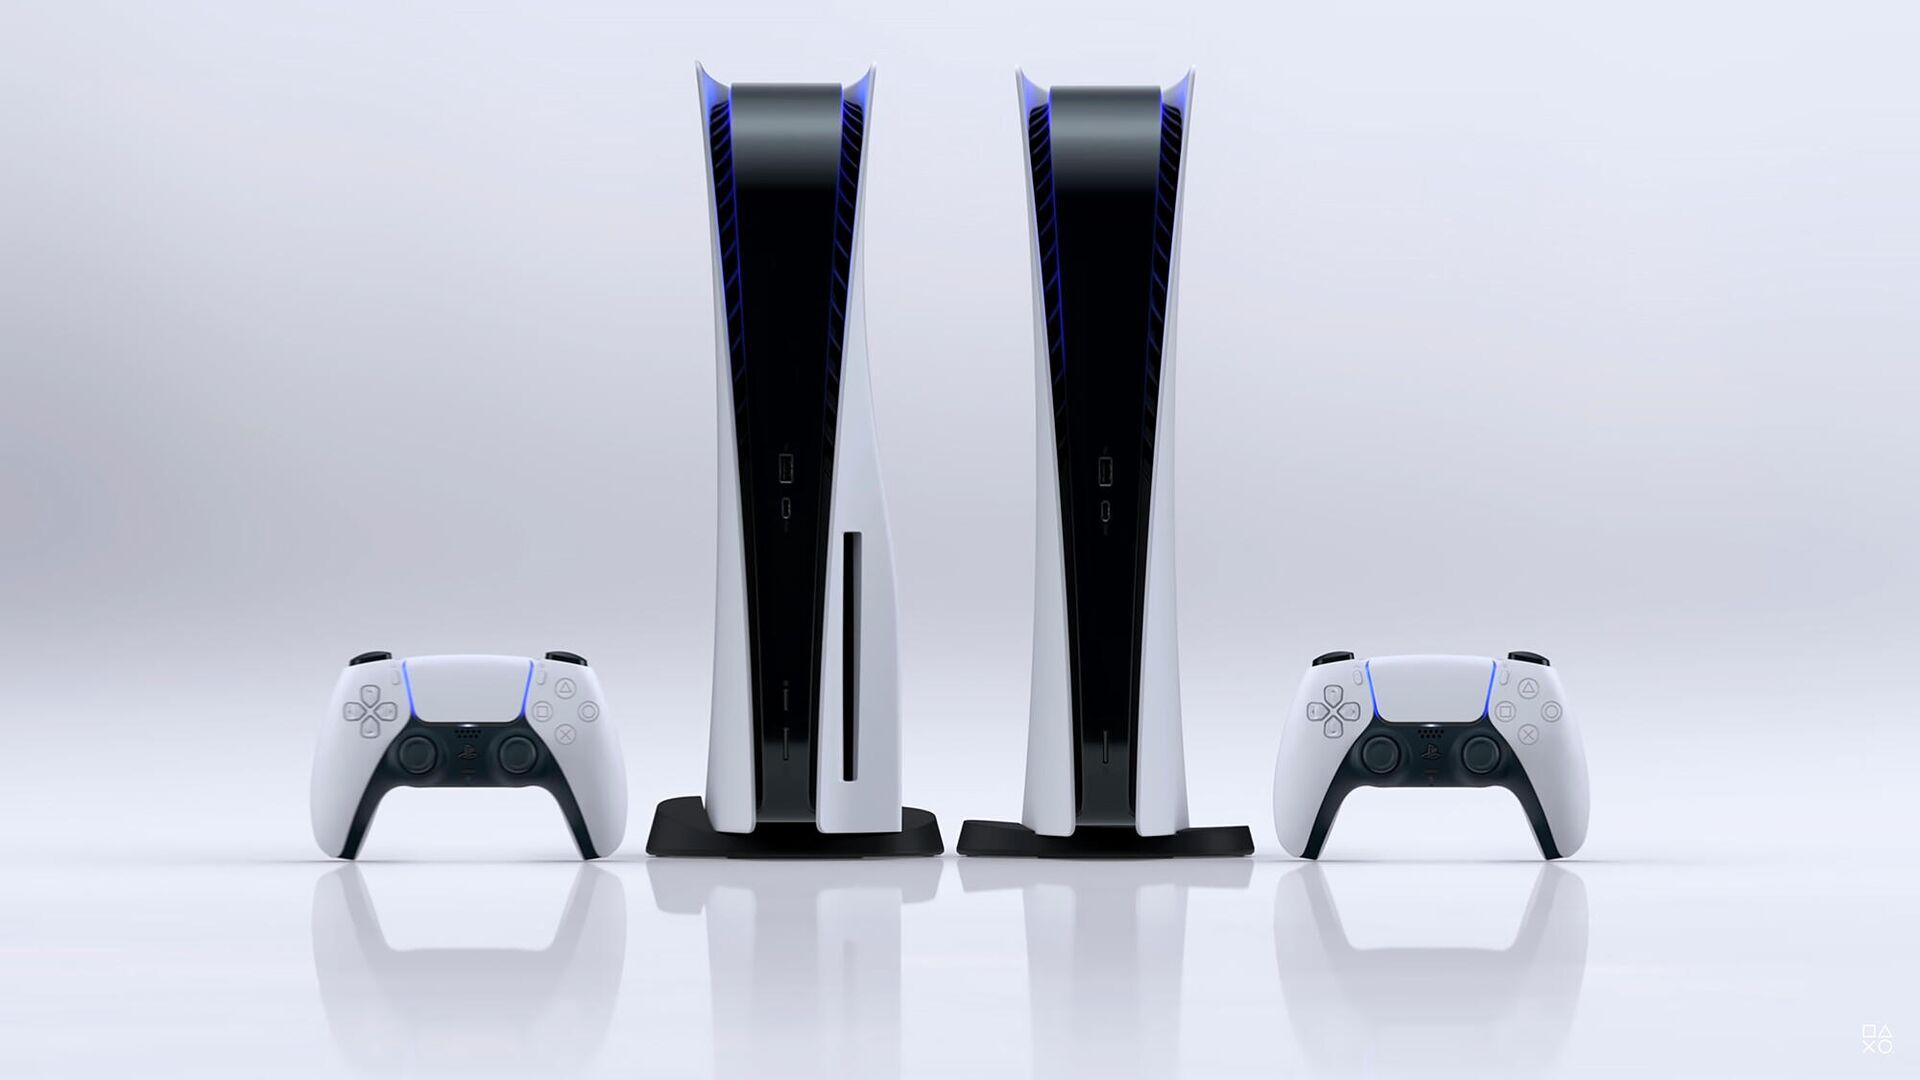 PlayStation 5 против Xbox Series X: чем интересны приставки-некстген